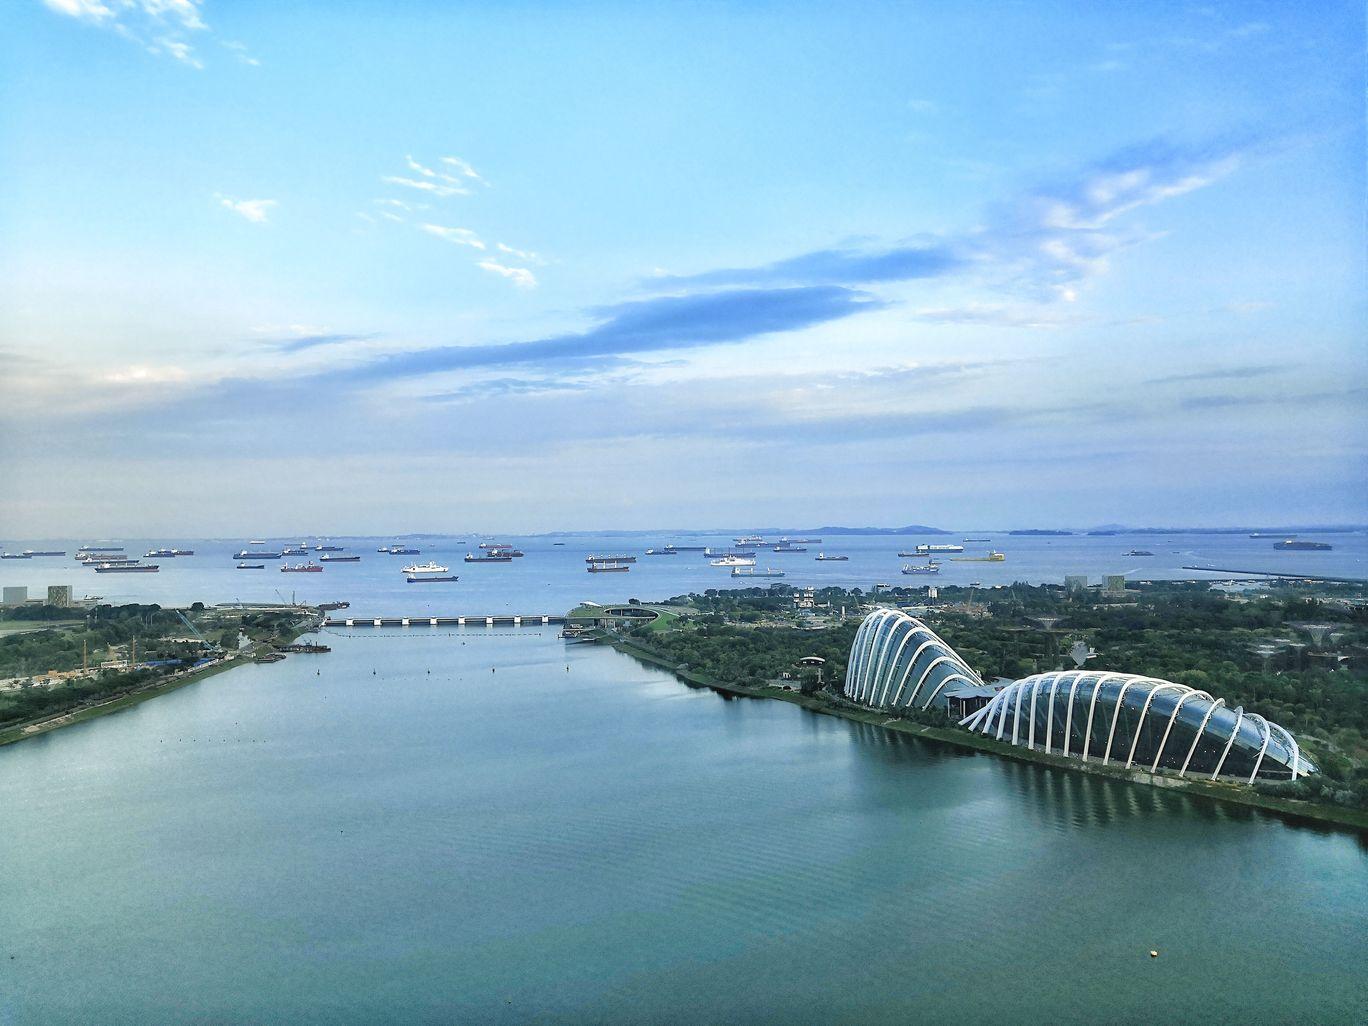 Photo of Singapore By Ankit Shrivastava